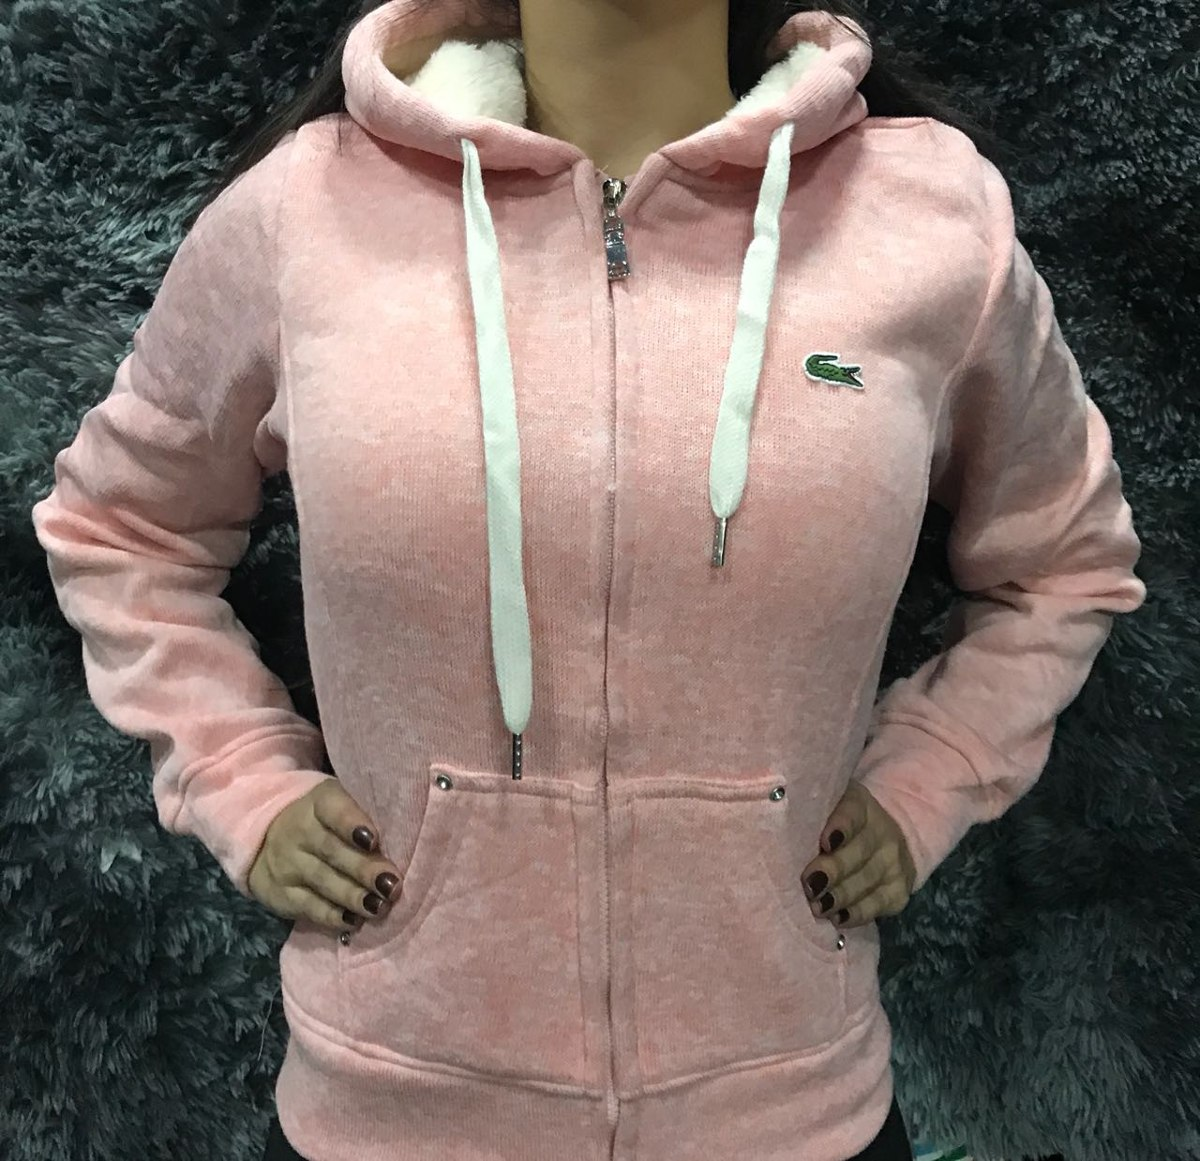 855e9bbe90b casaco blusa feminina lacoste para frio intenso frete gratis. Carregando  zoom.